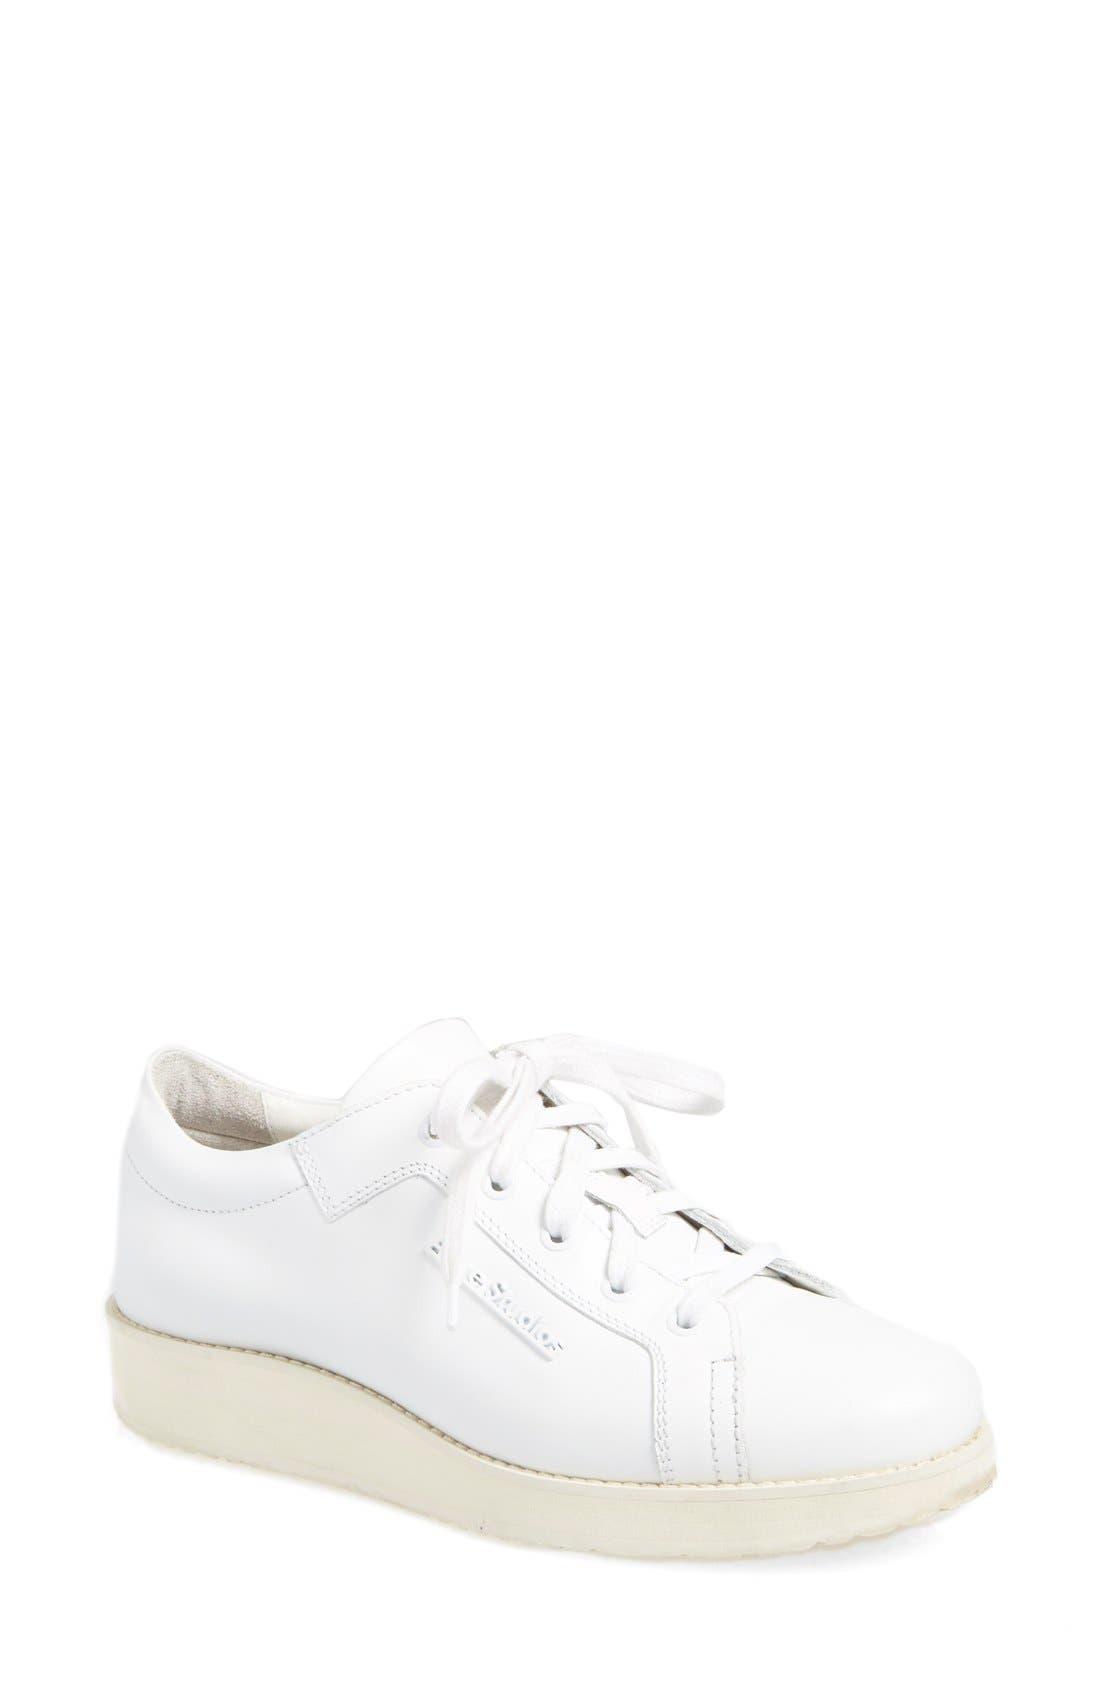 Kobe Platform Sneaker,                             Main thumbnail 1, color,                             100